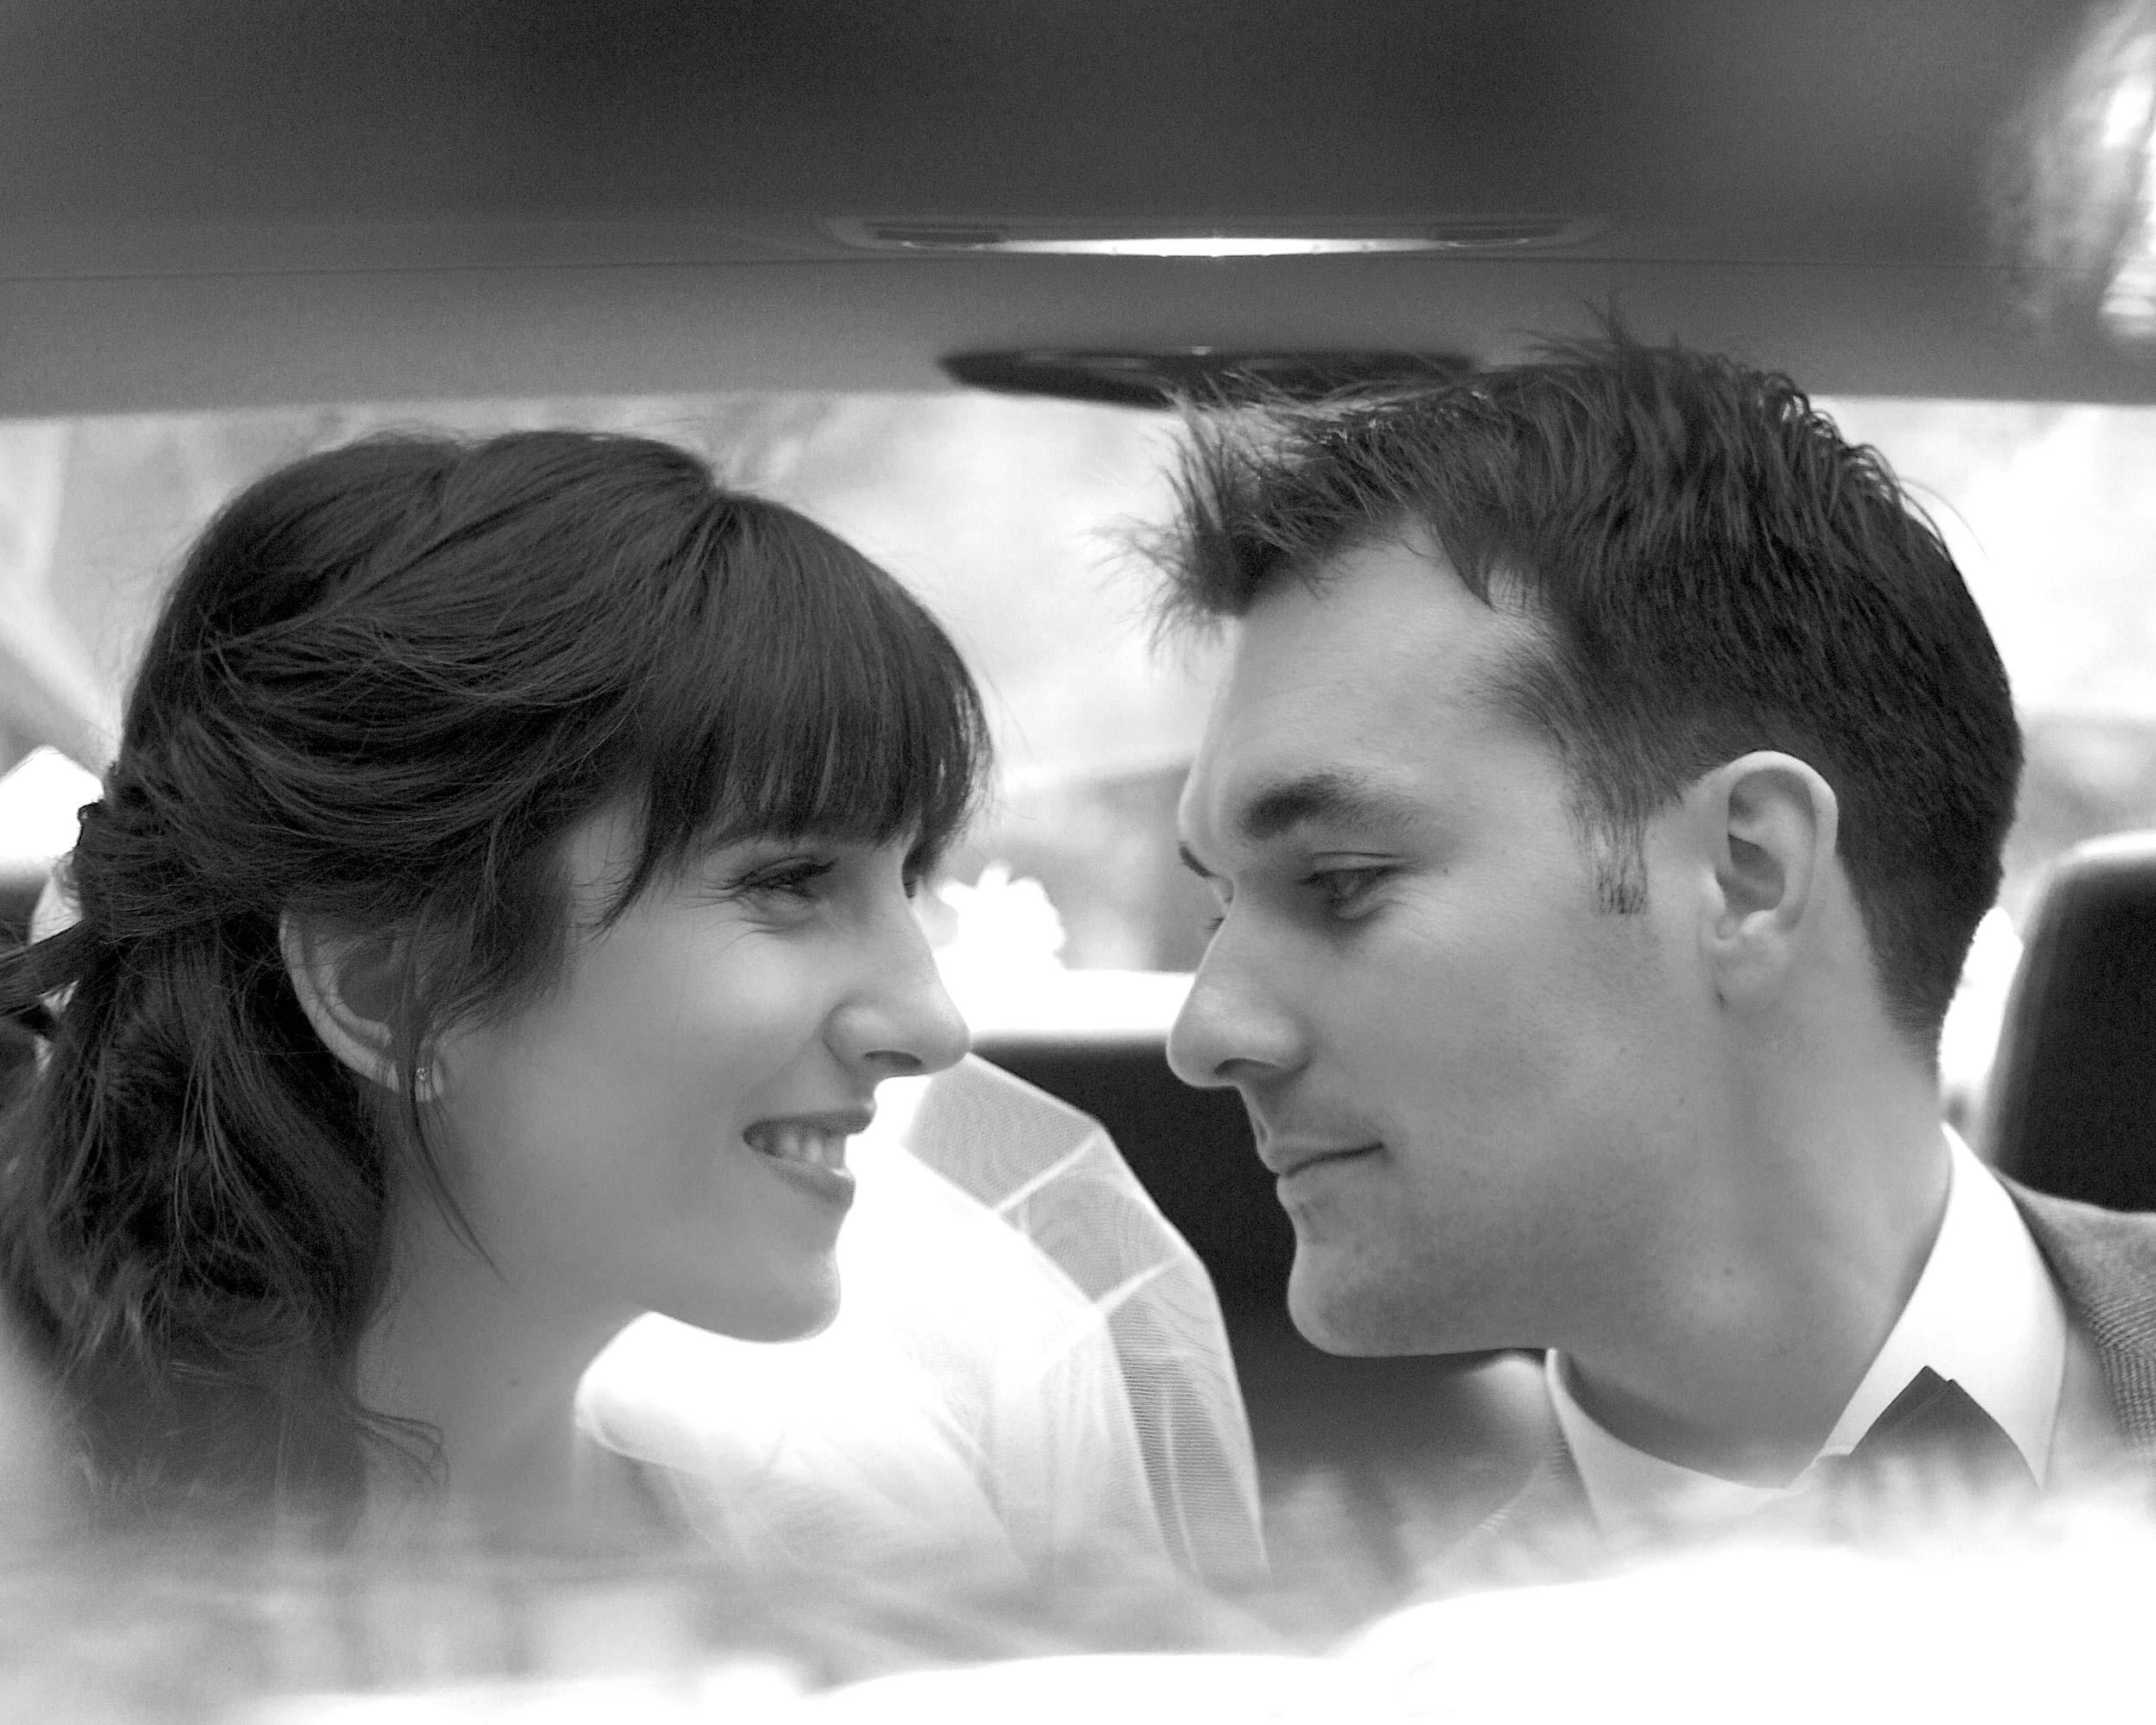 lifestyle photographe mariage biarritz - 11